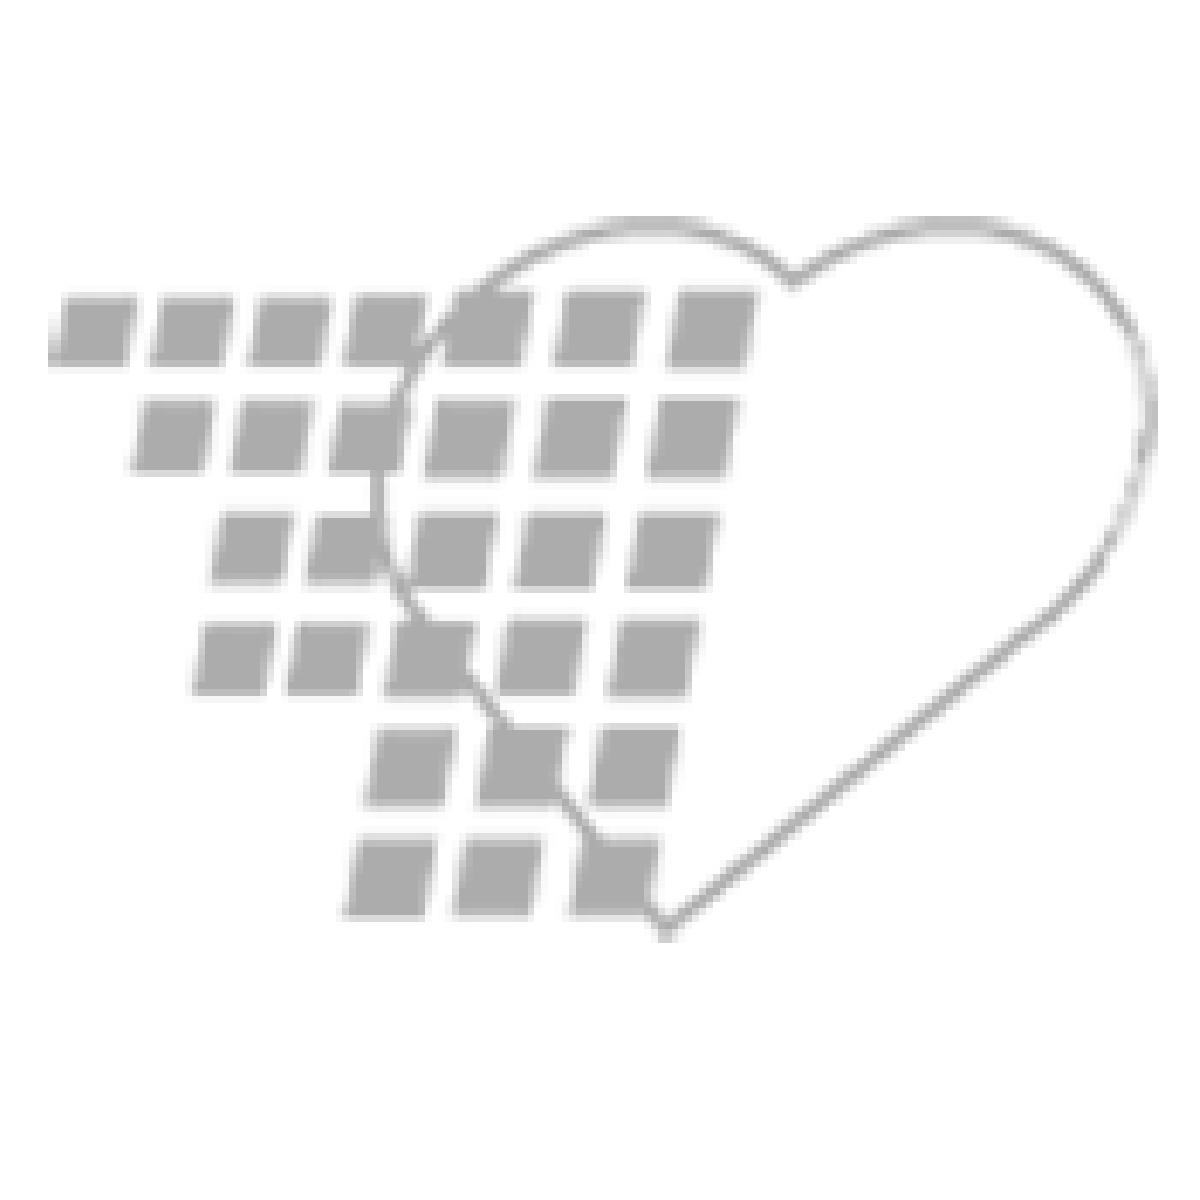 02-20-3400-HNDHLD - Welch Allyn Connex ProBP 3400 Digital Blood Pressure Device - Handheld